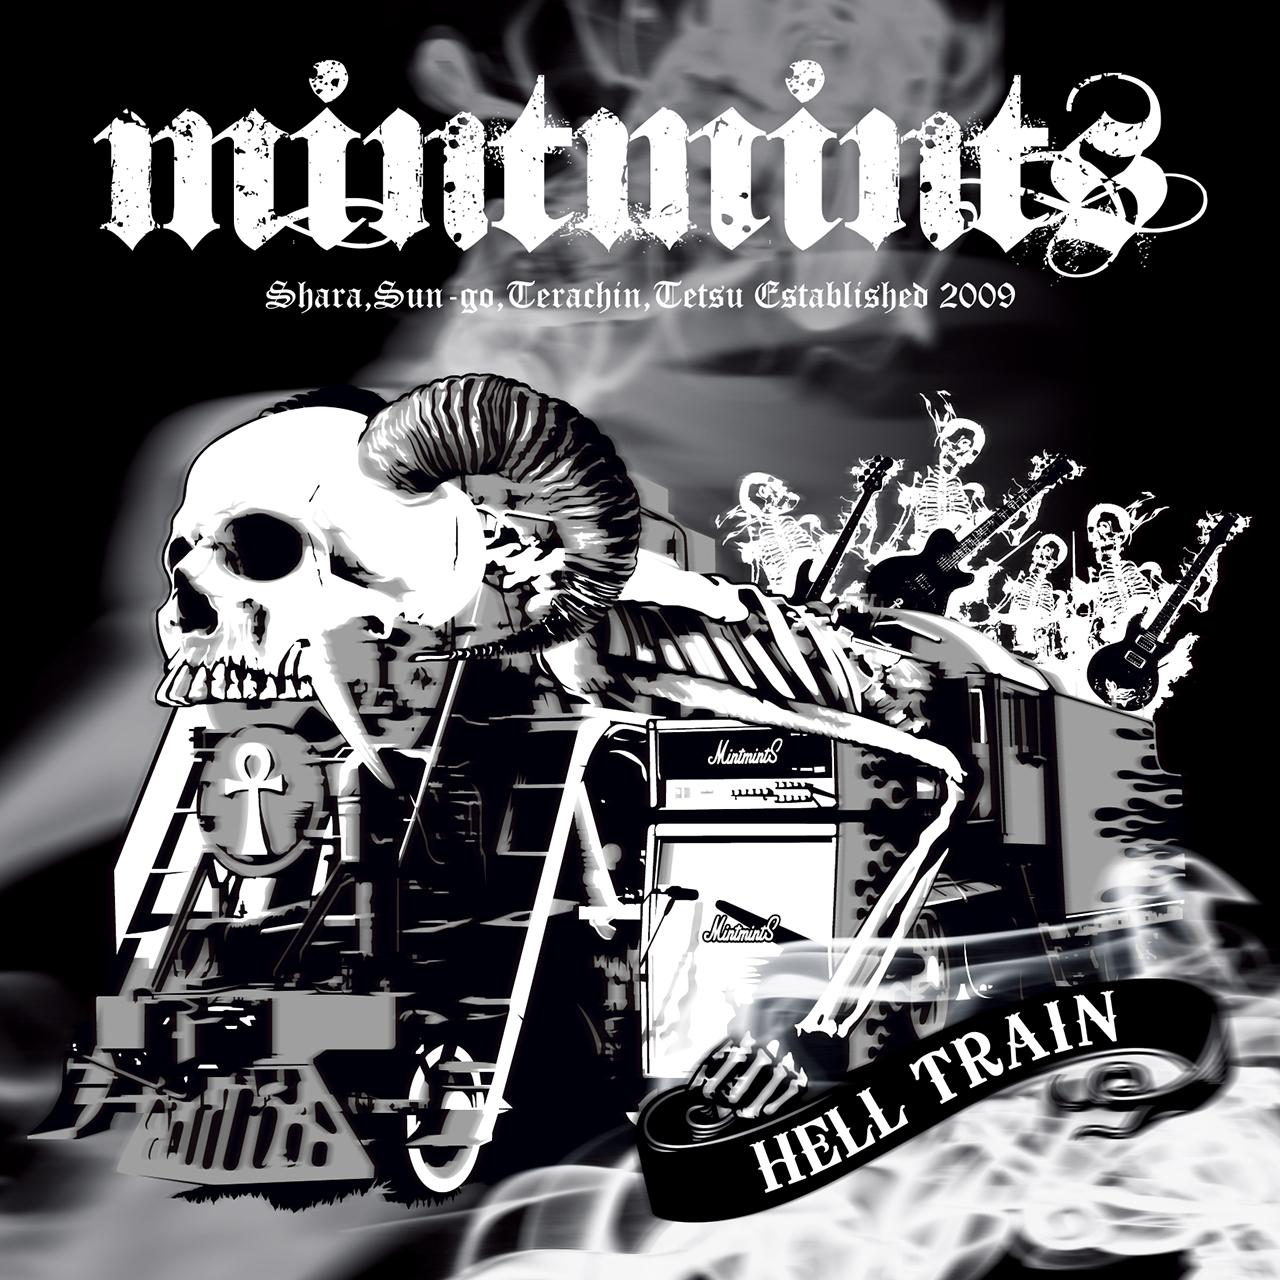 CD+DVD:『HELLTRAIN』mintmints(ミントミンツ) - 画像1